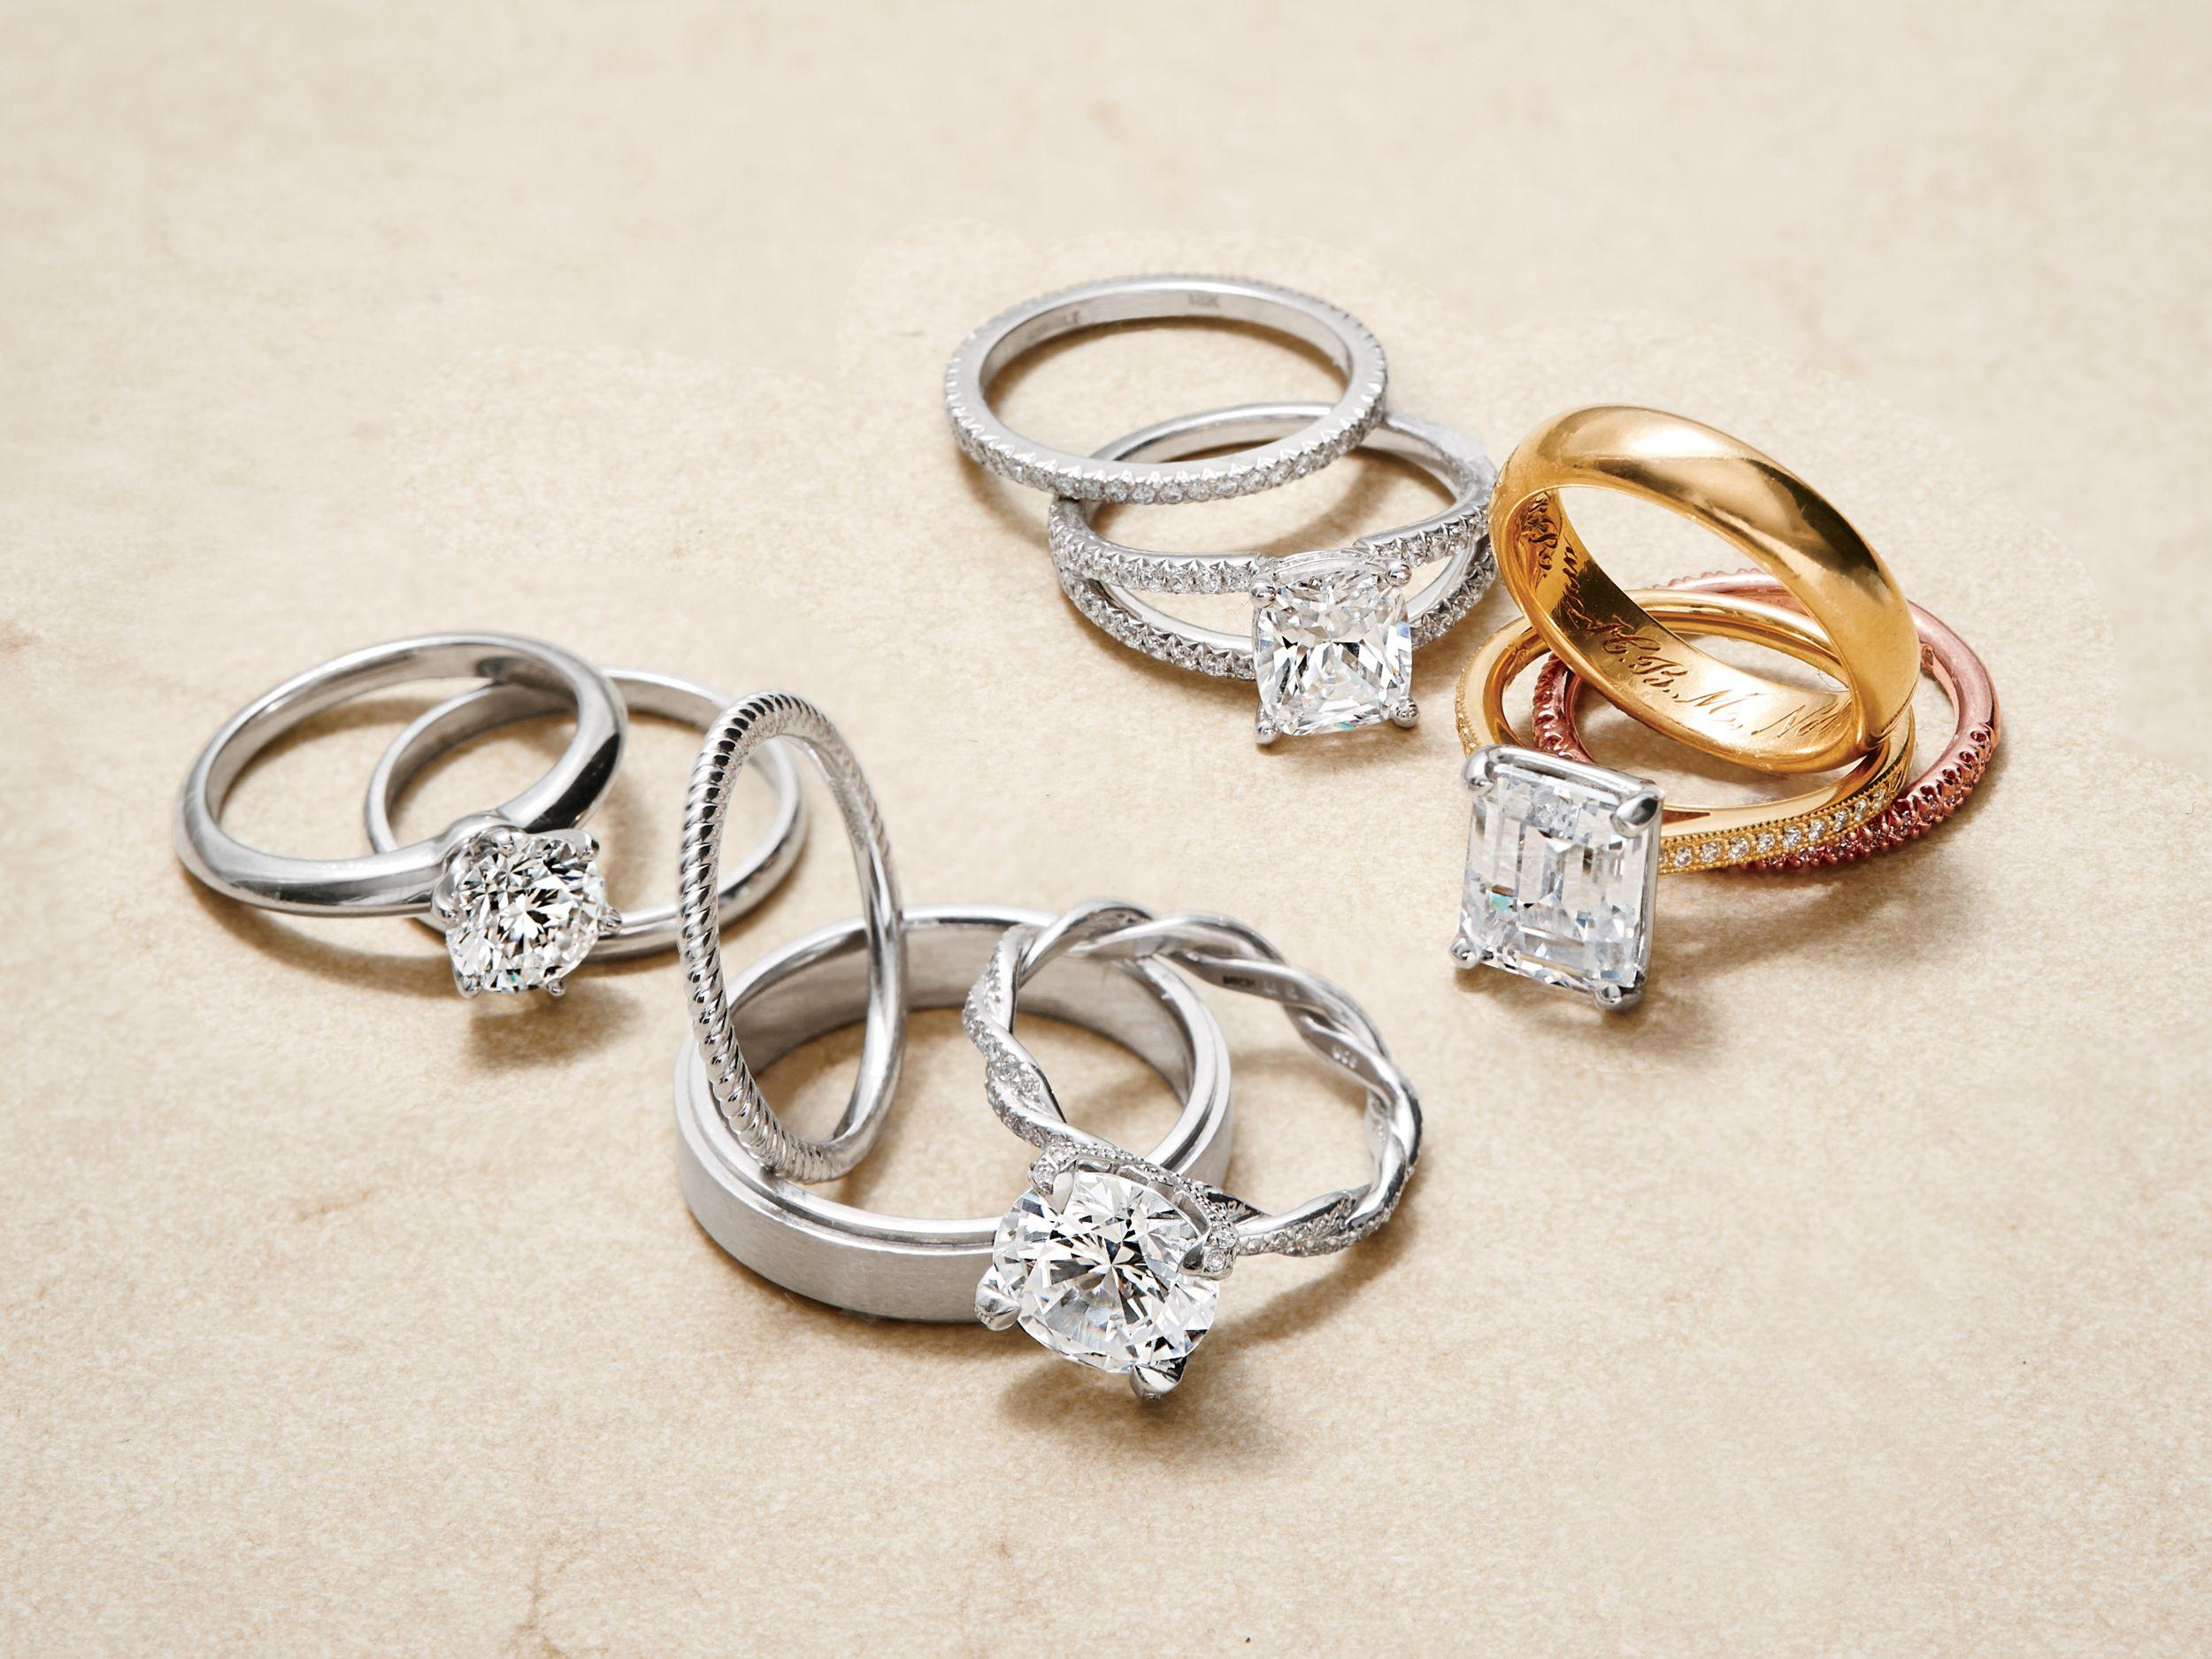 Fedi nuziali d'oro o d'argento?